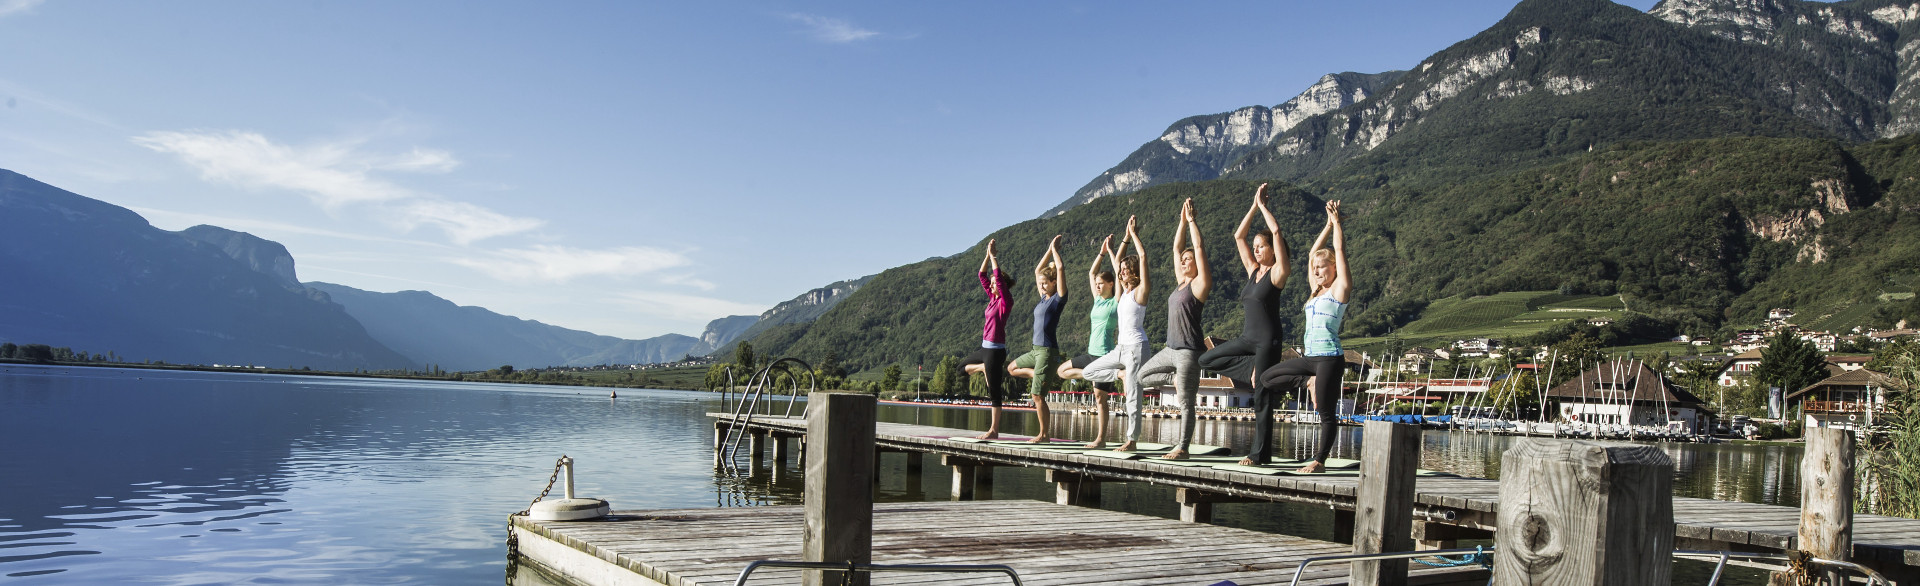 Yoga Kurse am Kalterer See - Yoga im See Hotel Kaltern